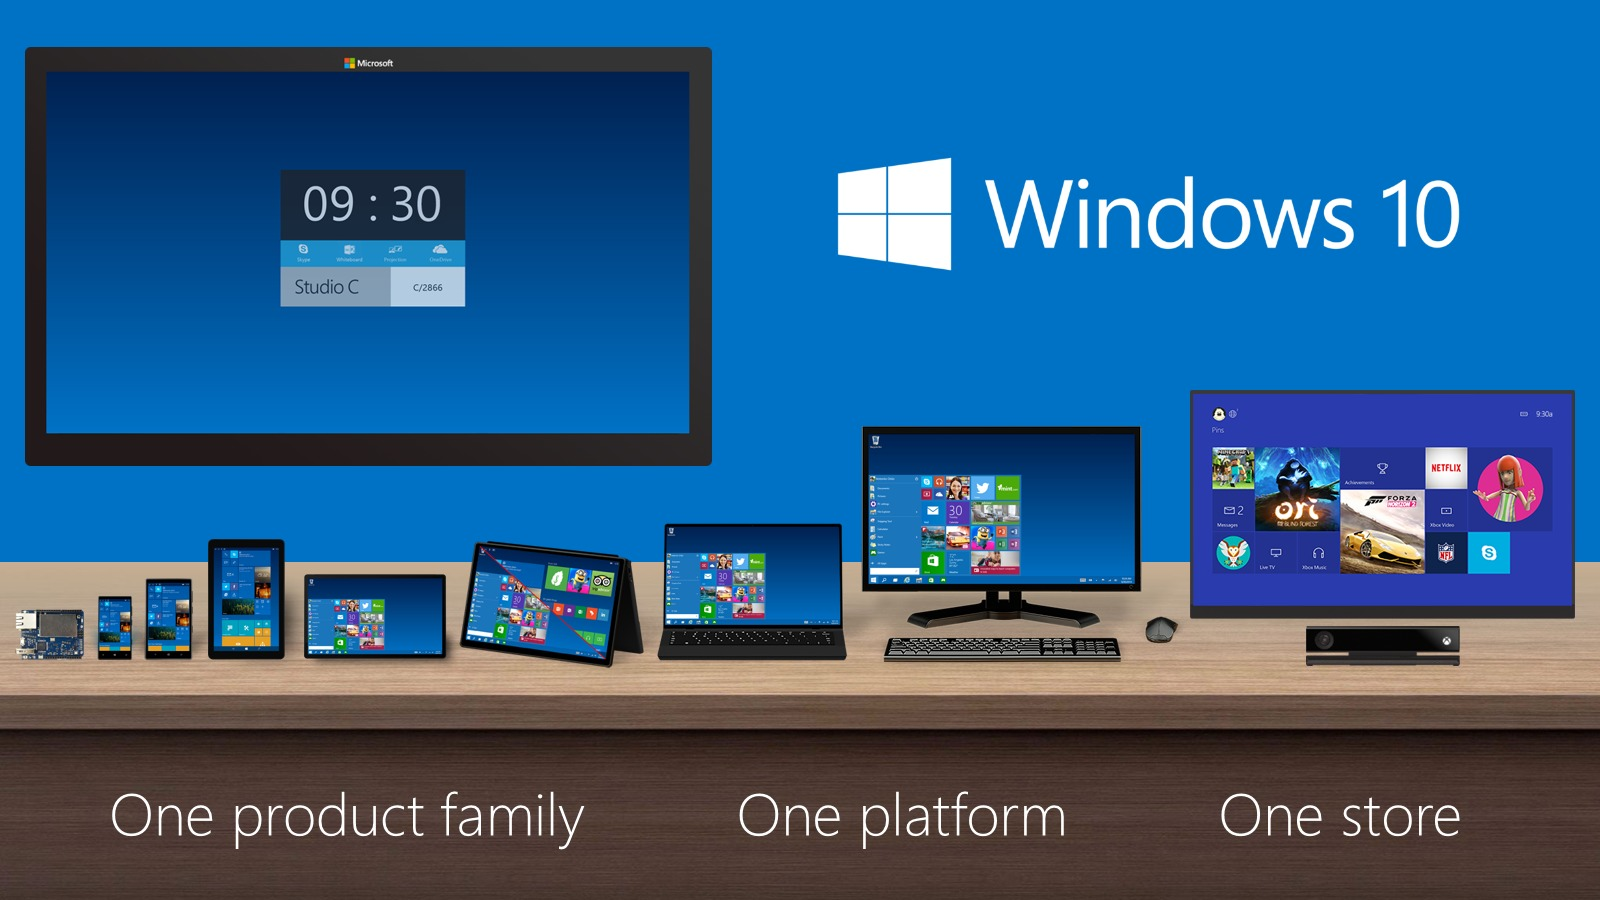 Microsoft Windows 10 Home 64-bit & 32-bit image